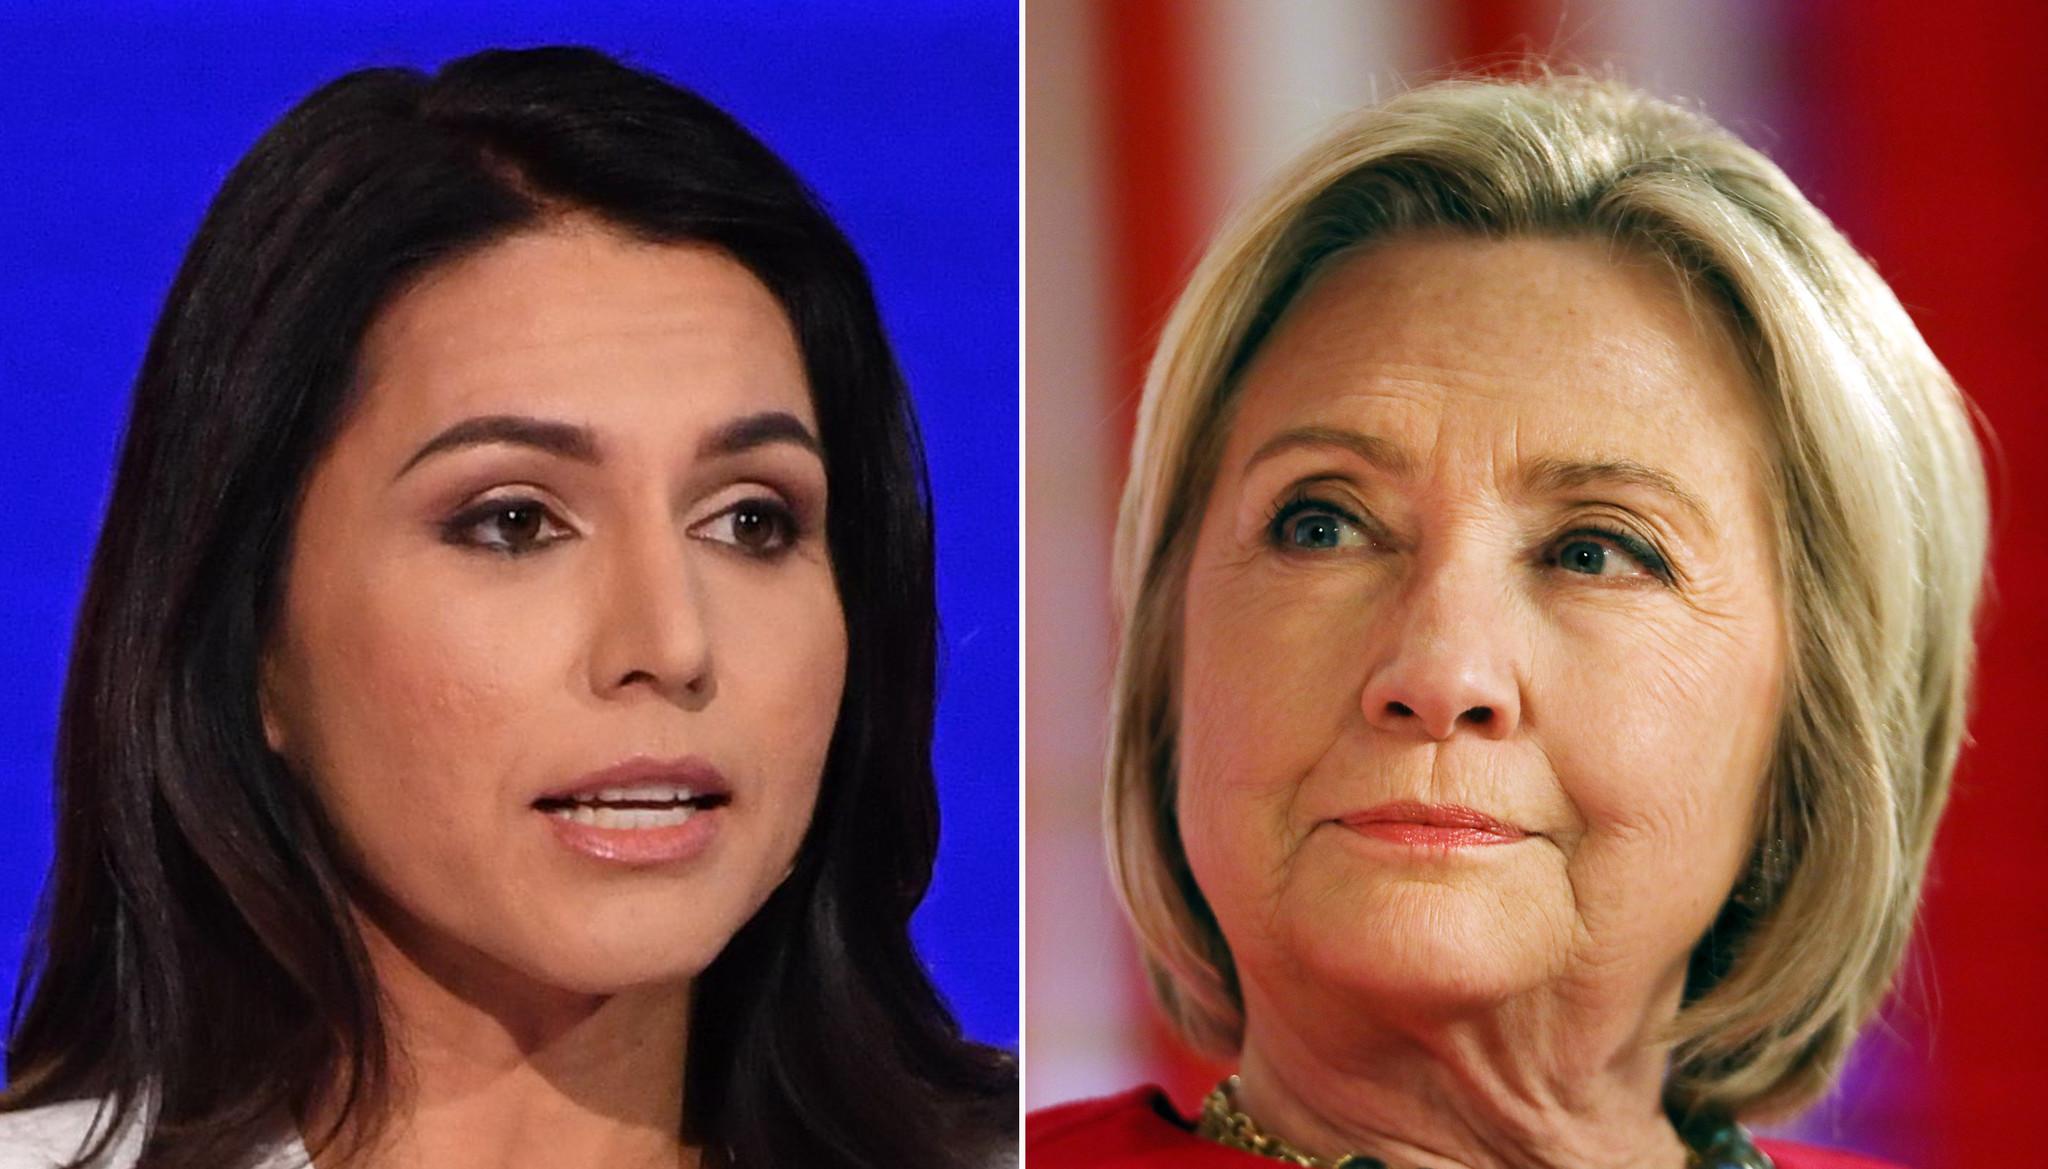 Tulsi Gabbard sues Hillary Clinton over 'Russian asset' jibe